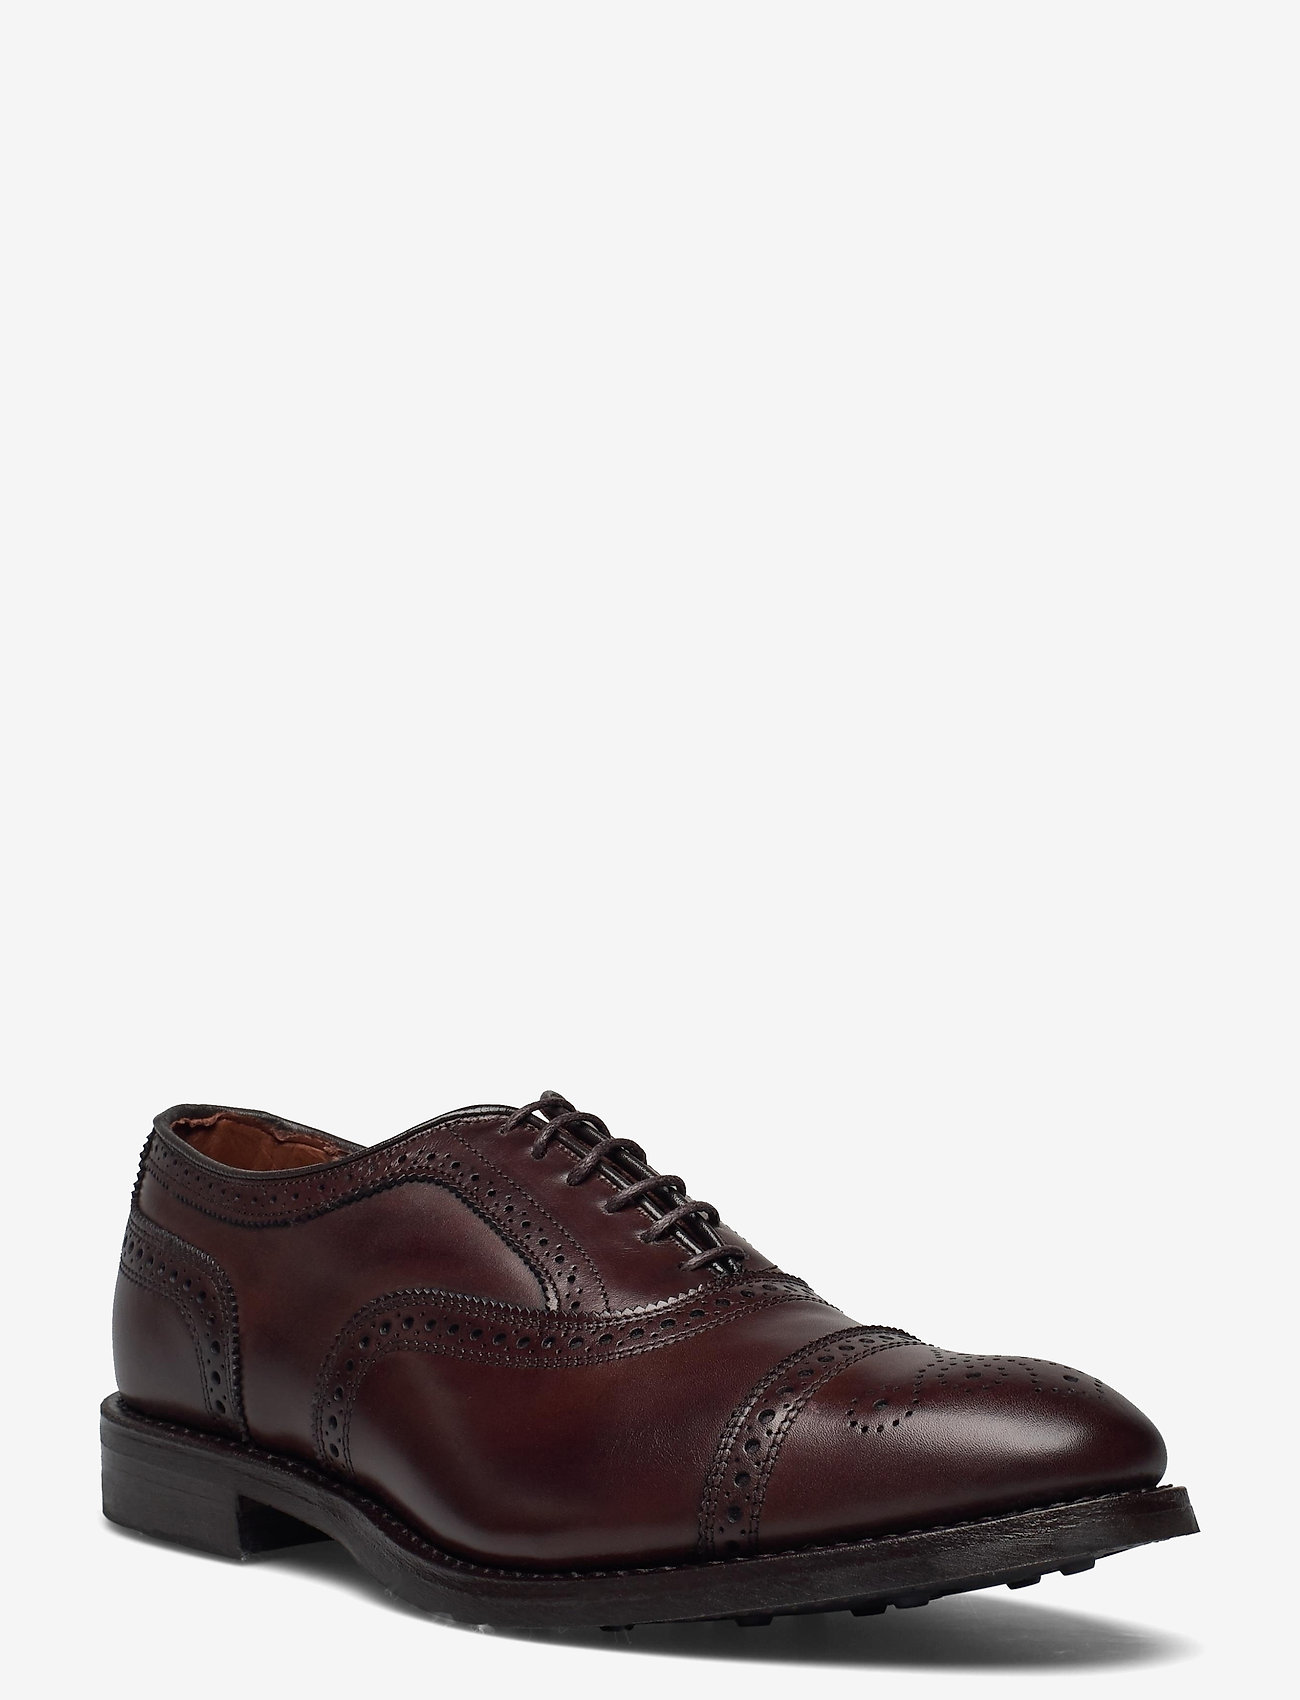 Allen Edmonds - Strand /Dainite Sole - business - brown - 0